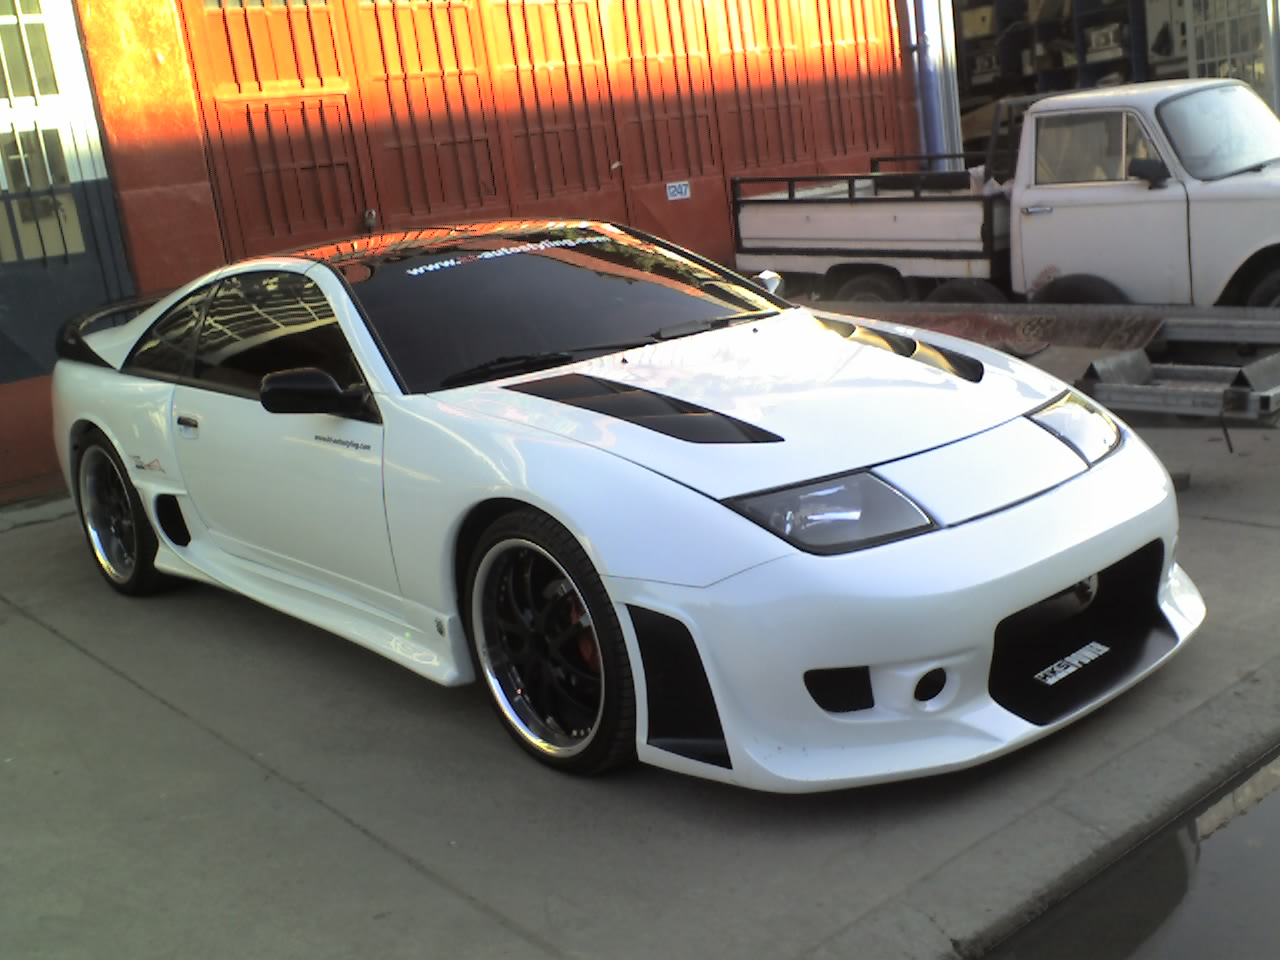 http://3.bp.blogspot.com/-Tiz-gO2HD8E/TtMAXQ7aX_I/AAAAAAAABso/Uk_R6LxlYEs/s1600/nissin+car+wallpaper.jpg